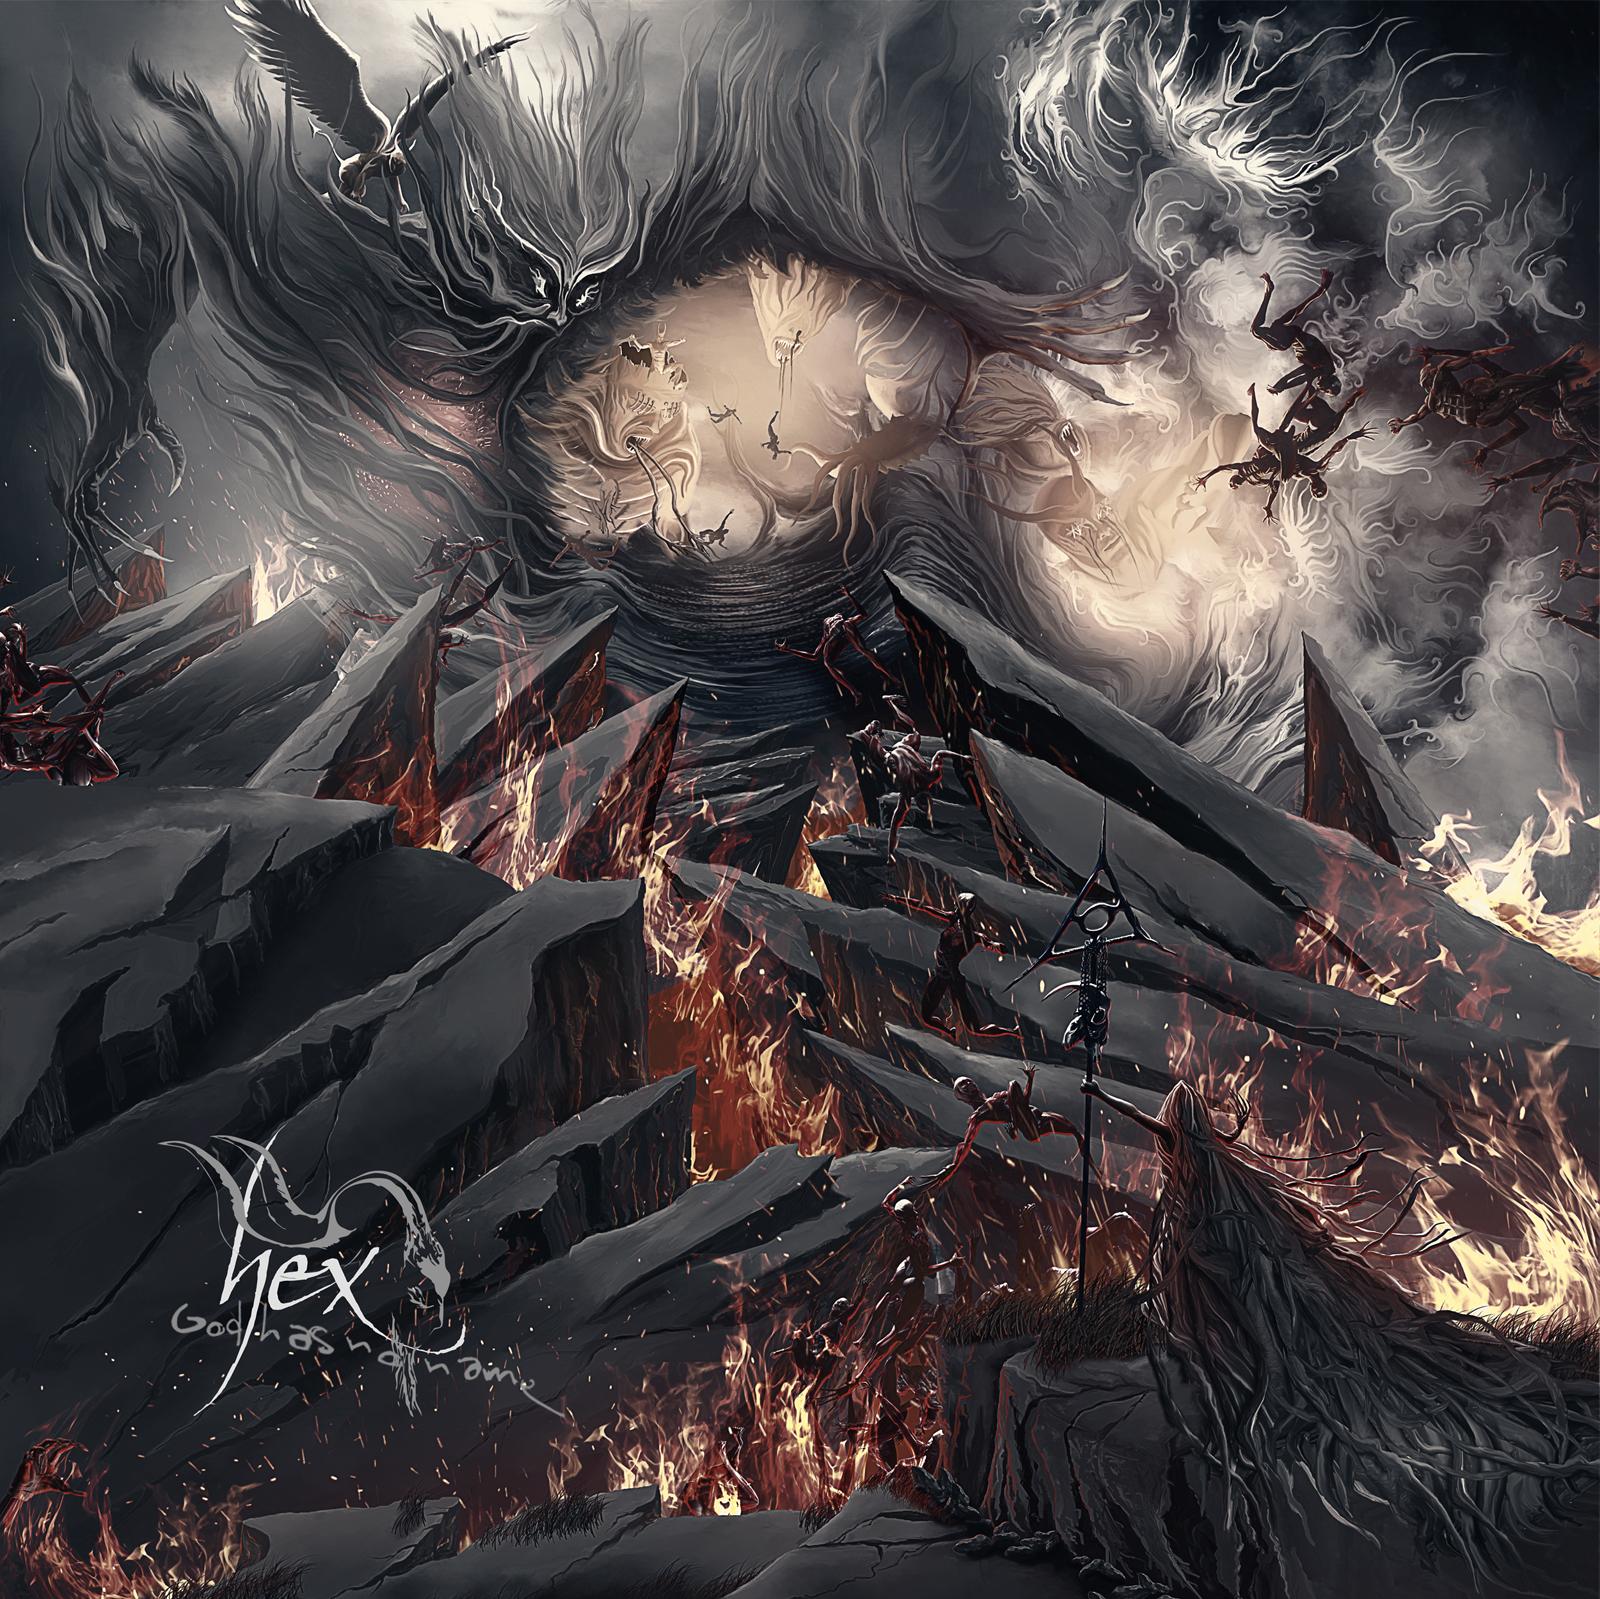 hex-god_has_no_name